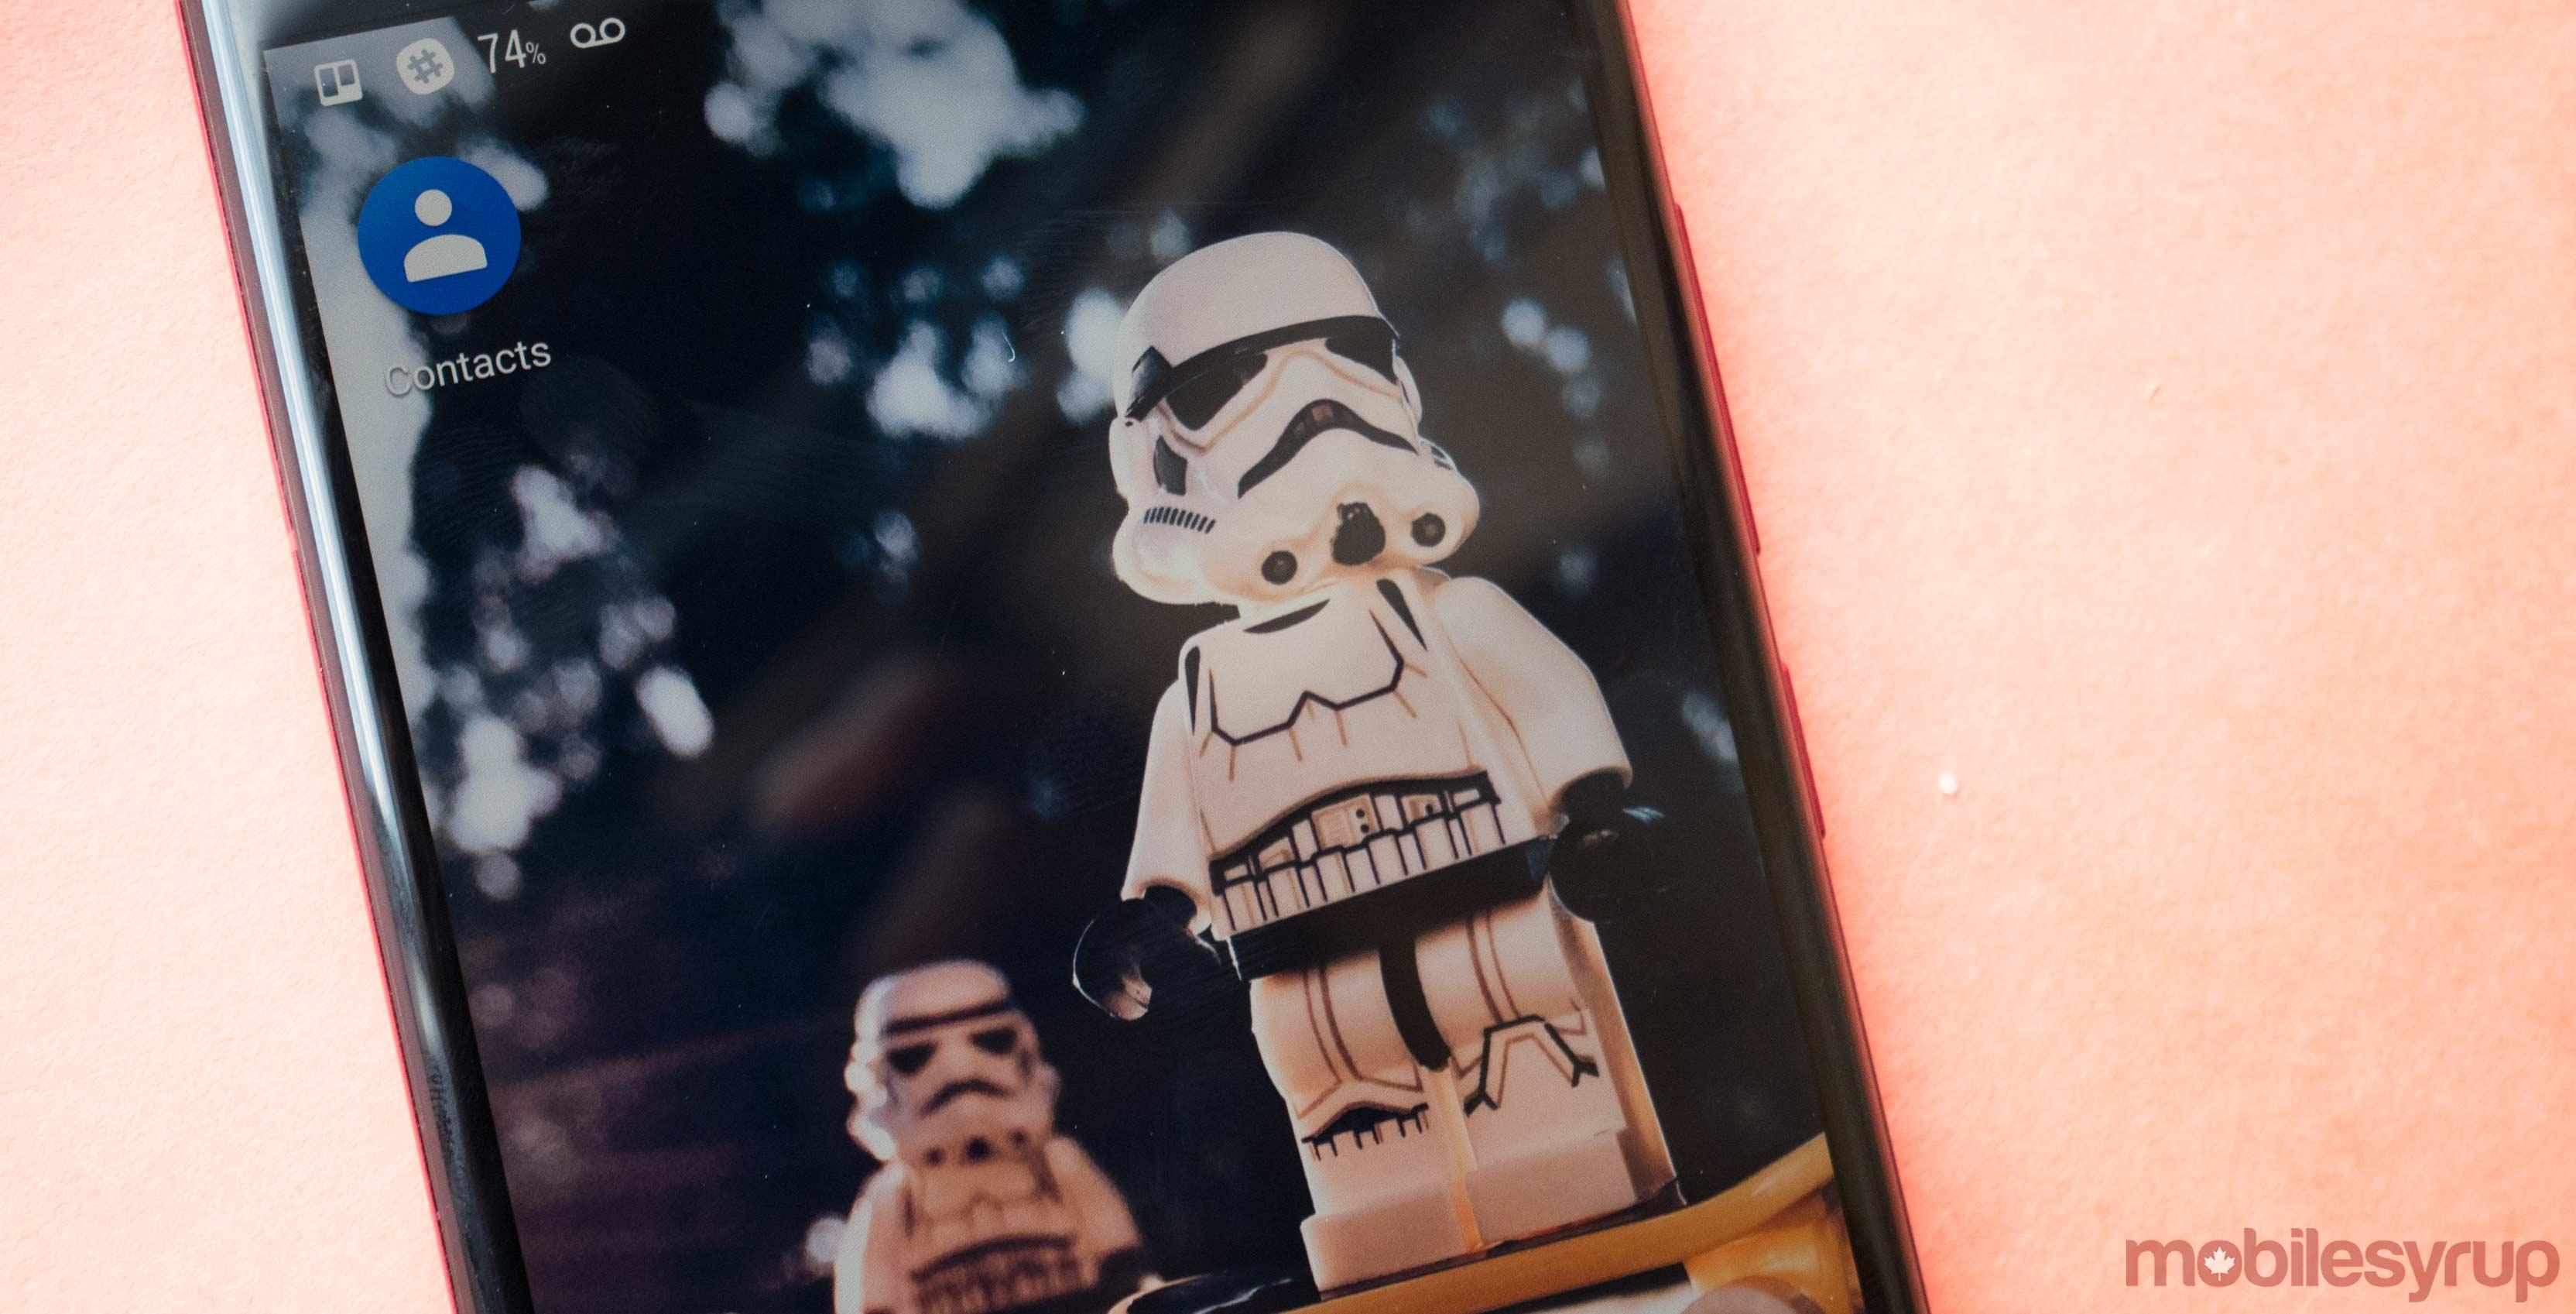 Google contact on HTC U11